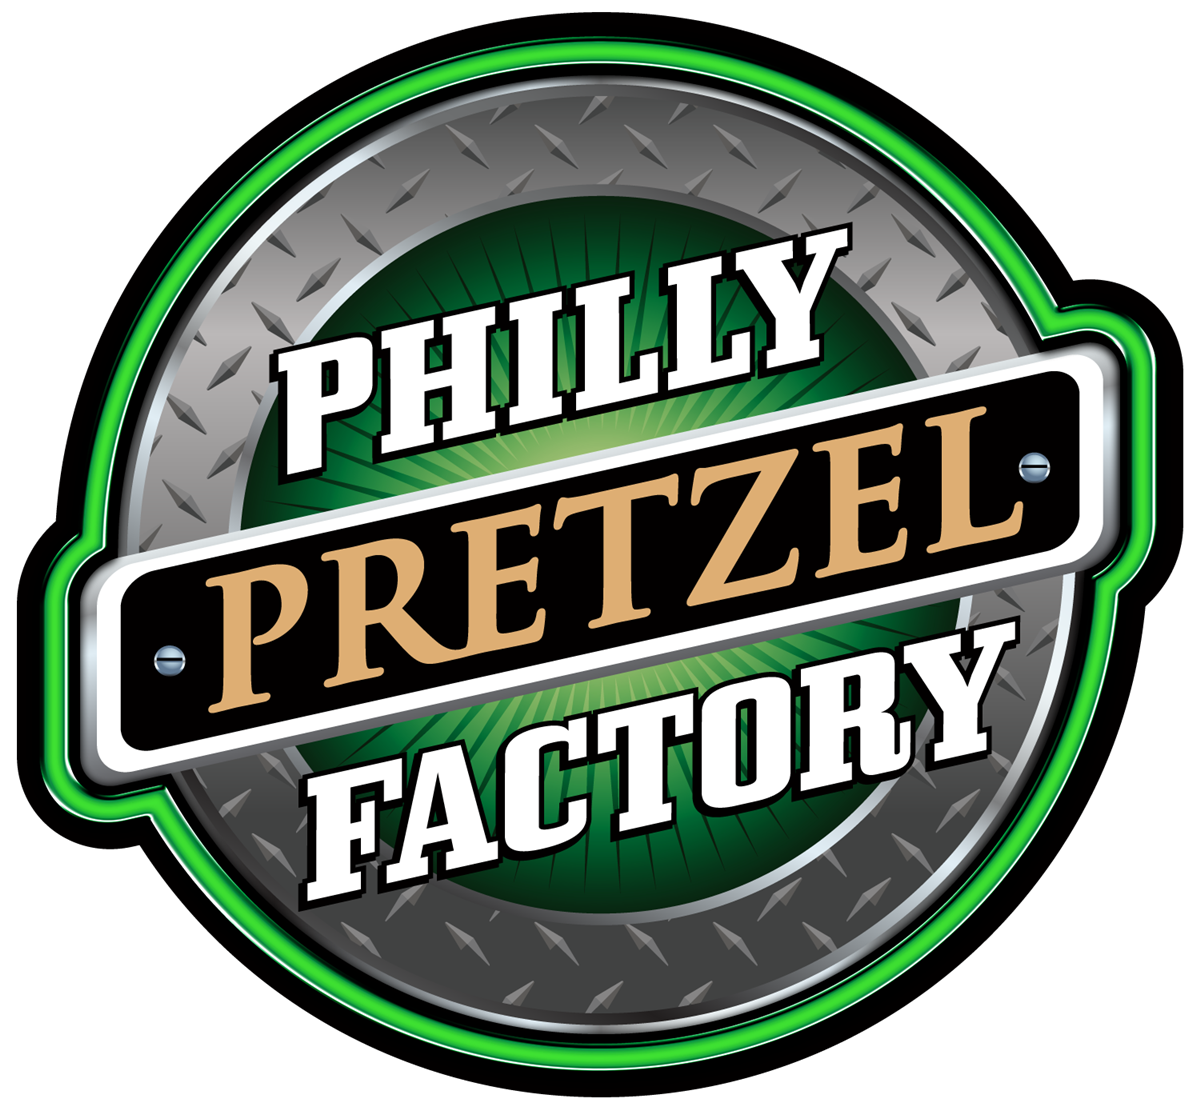 Philly_Pretzel_Factory